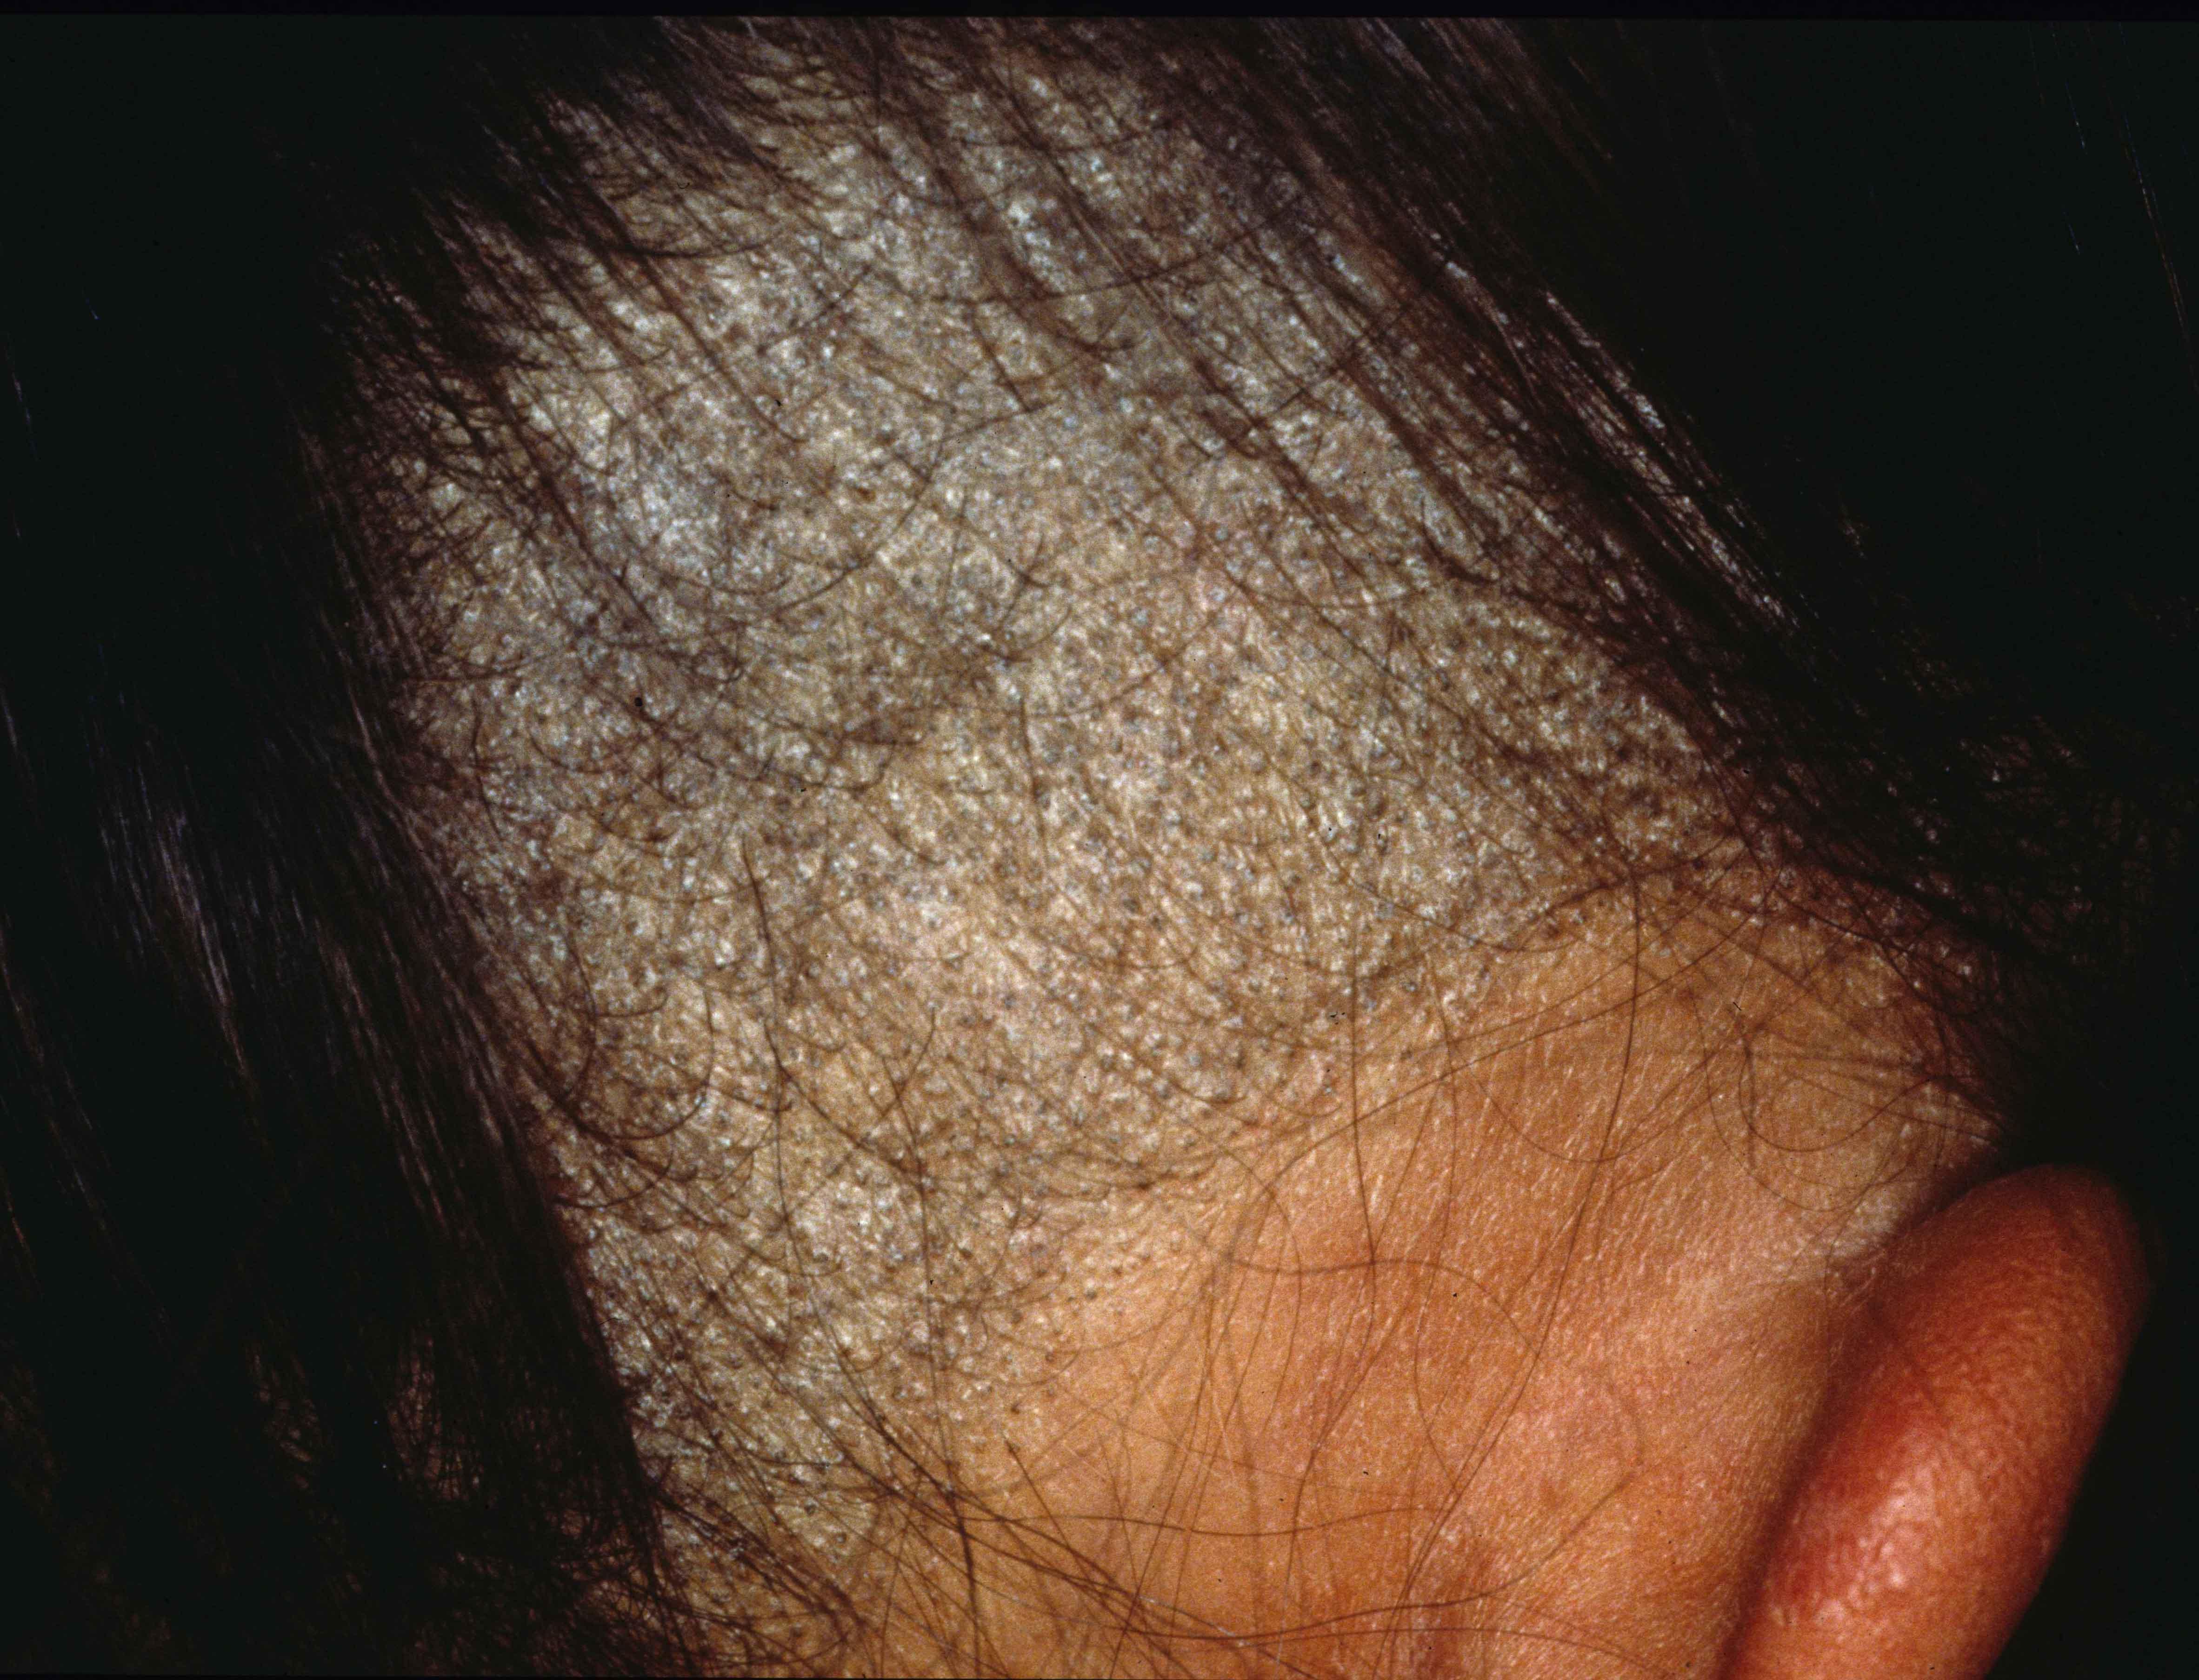 Superficial Mycoses Dermatophytosis Infectious Disease Advisor